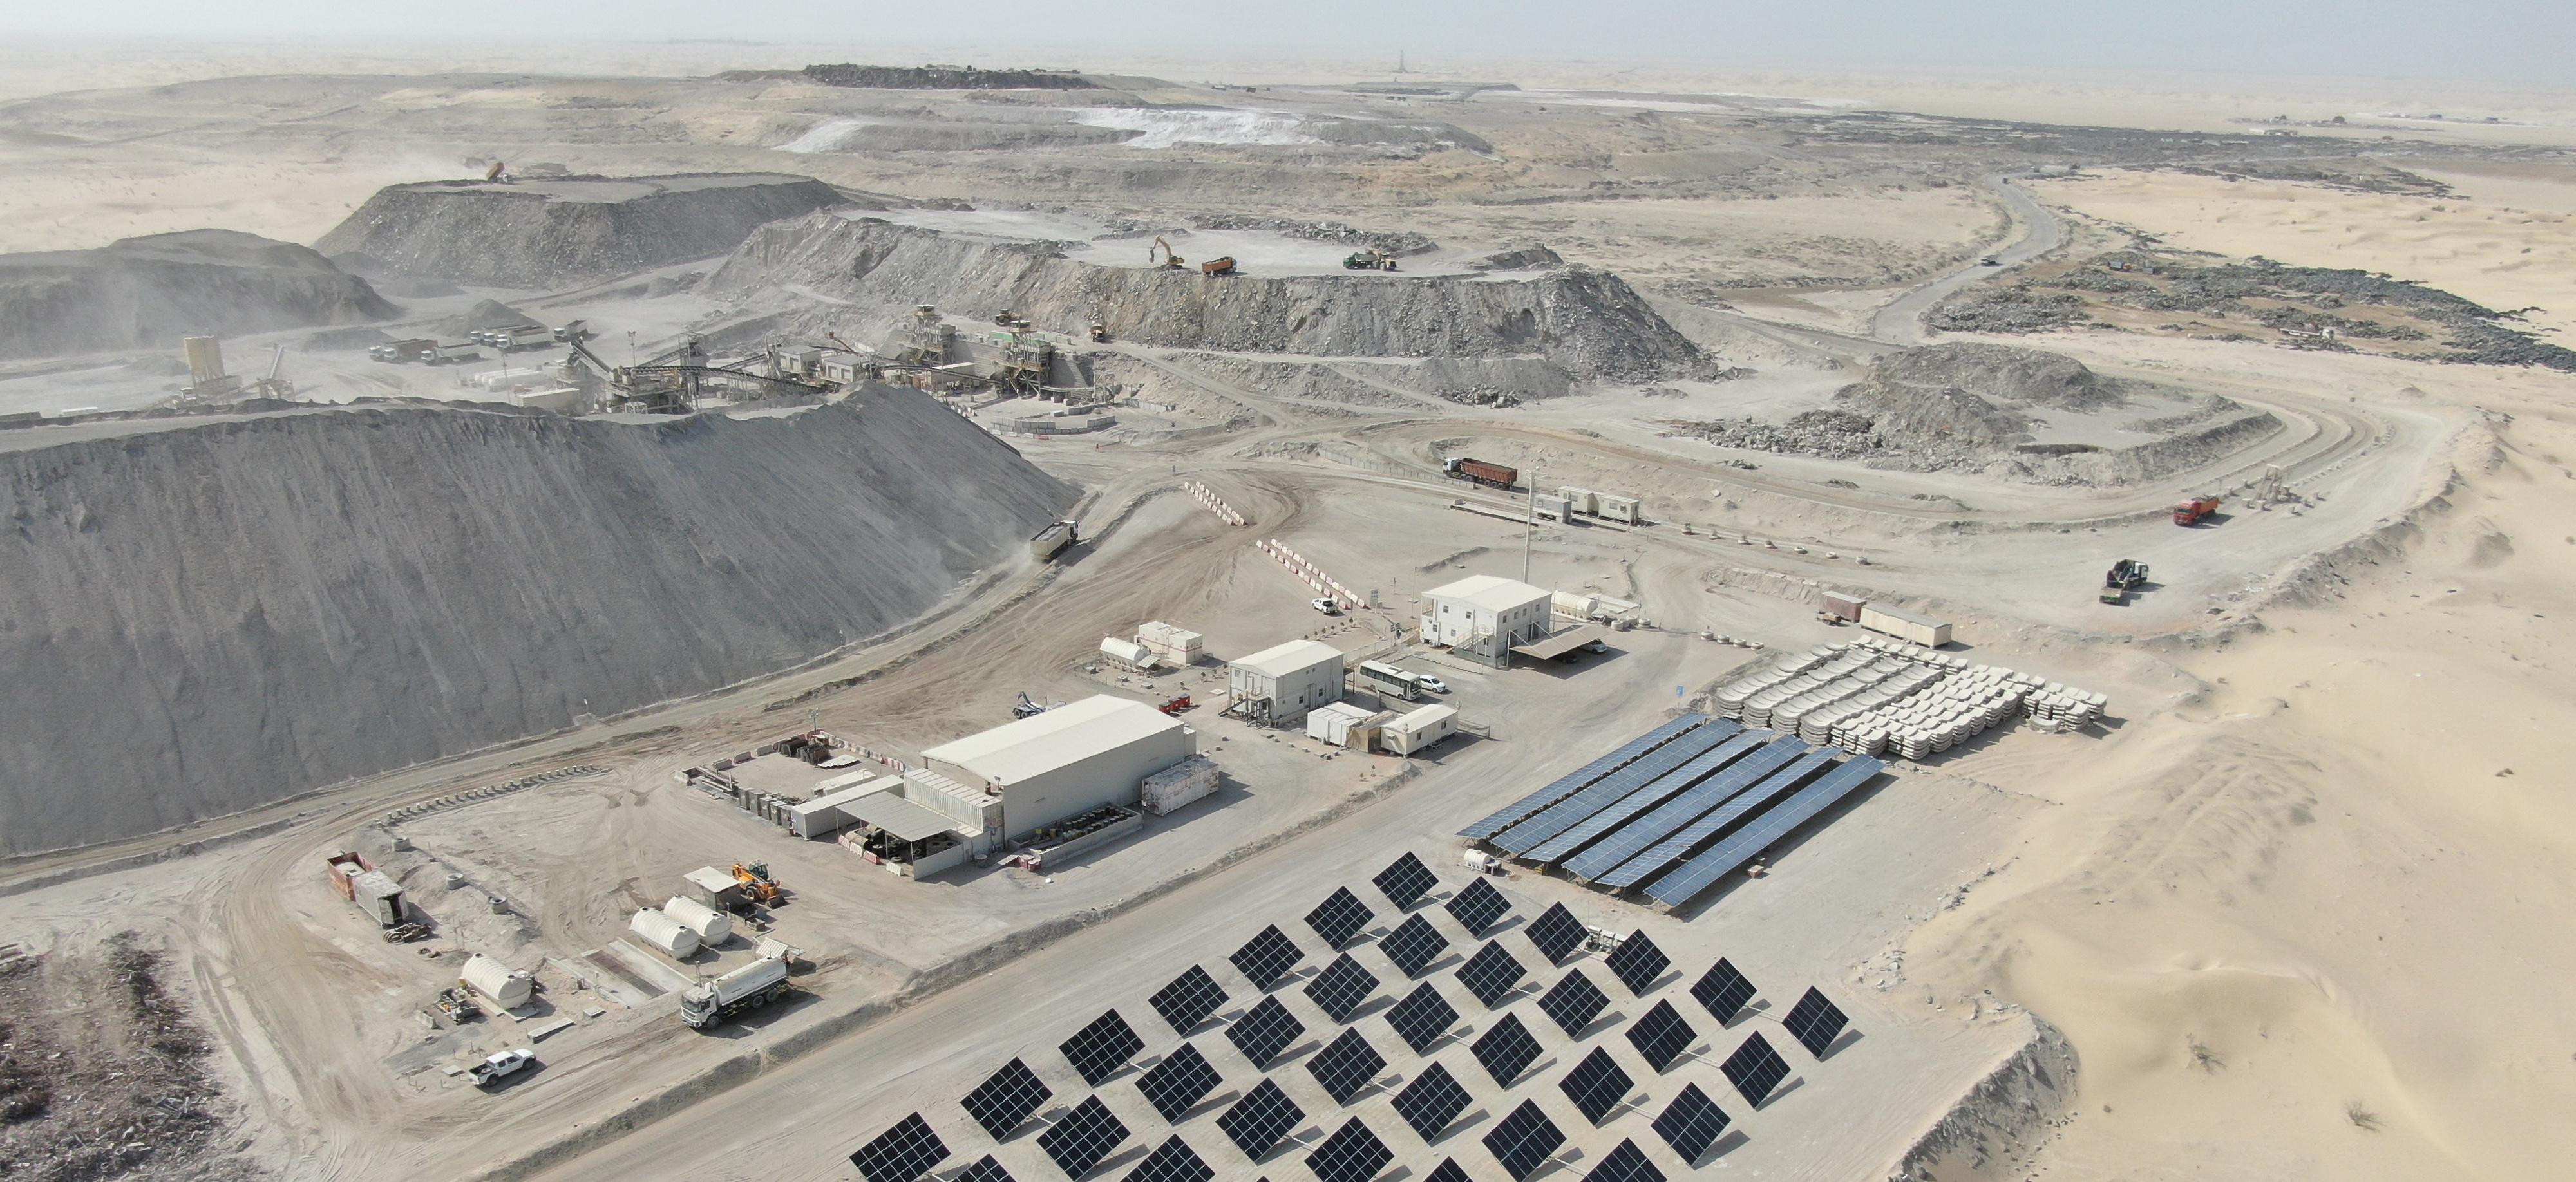 Al Dhafra Recycling Industries Abu Dhabi Microgrid Renewables